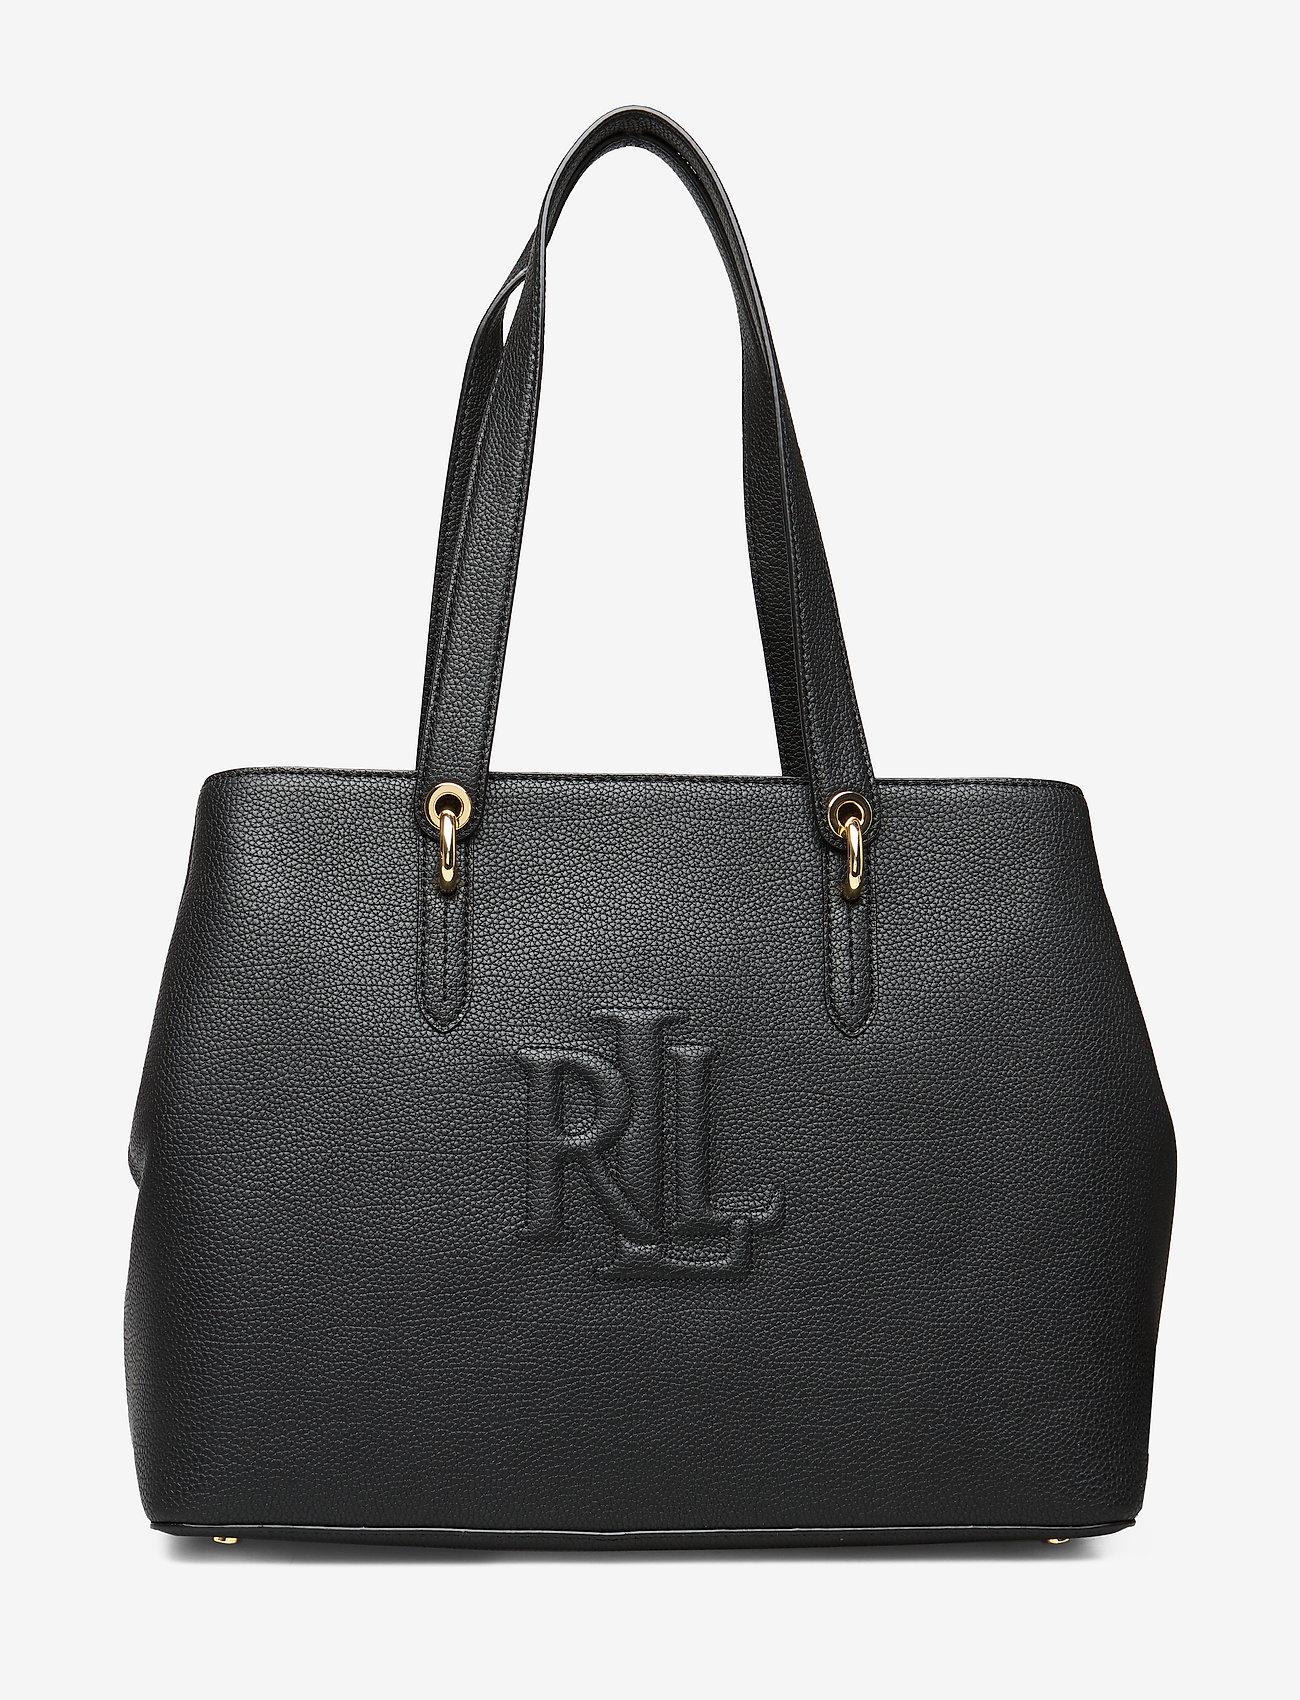 Lauren Ralph Leather Highfield Tote Bag - Shopping Black